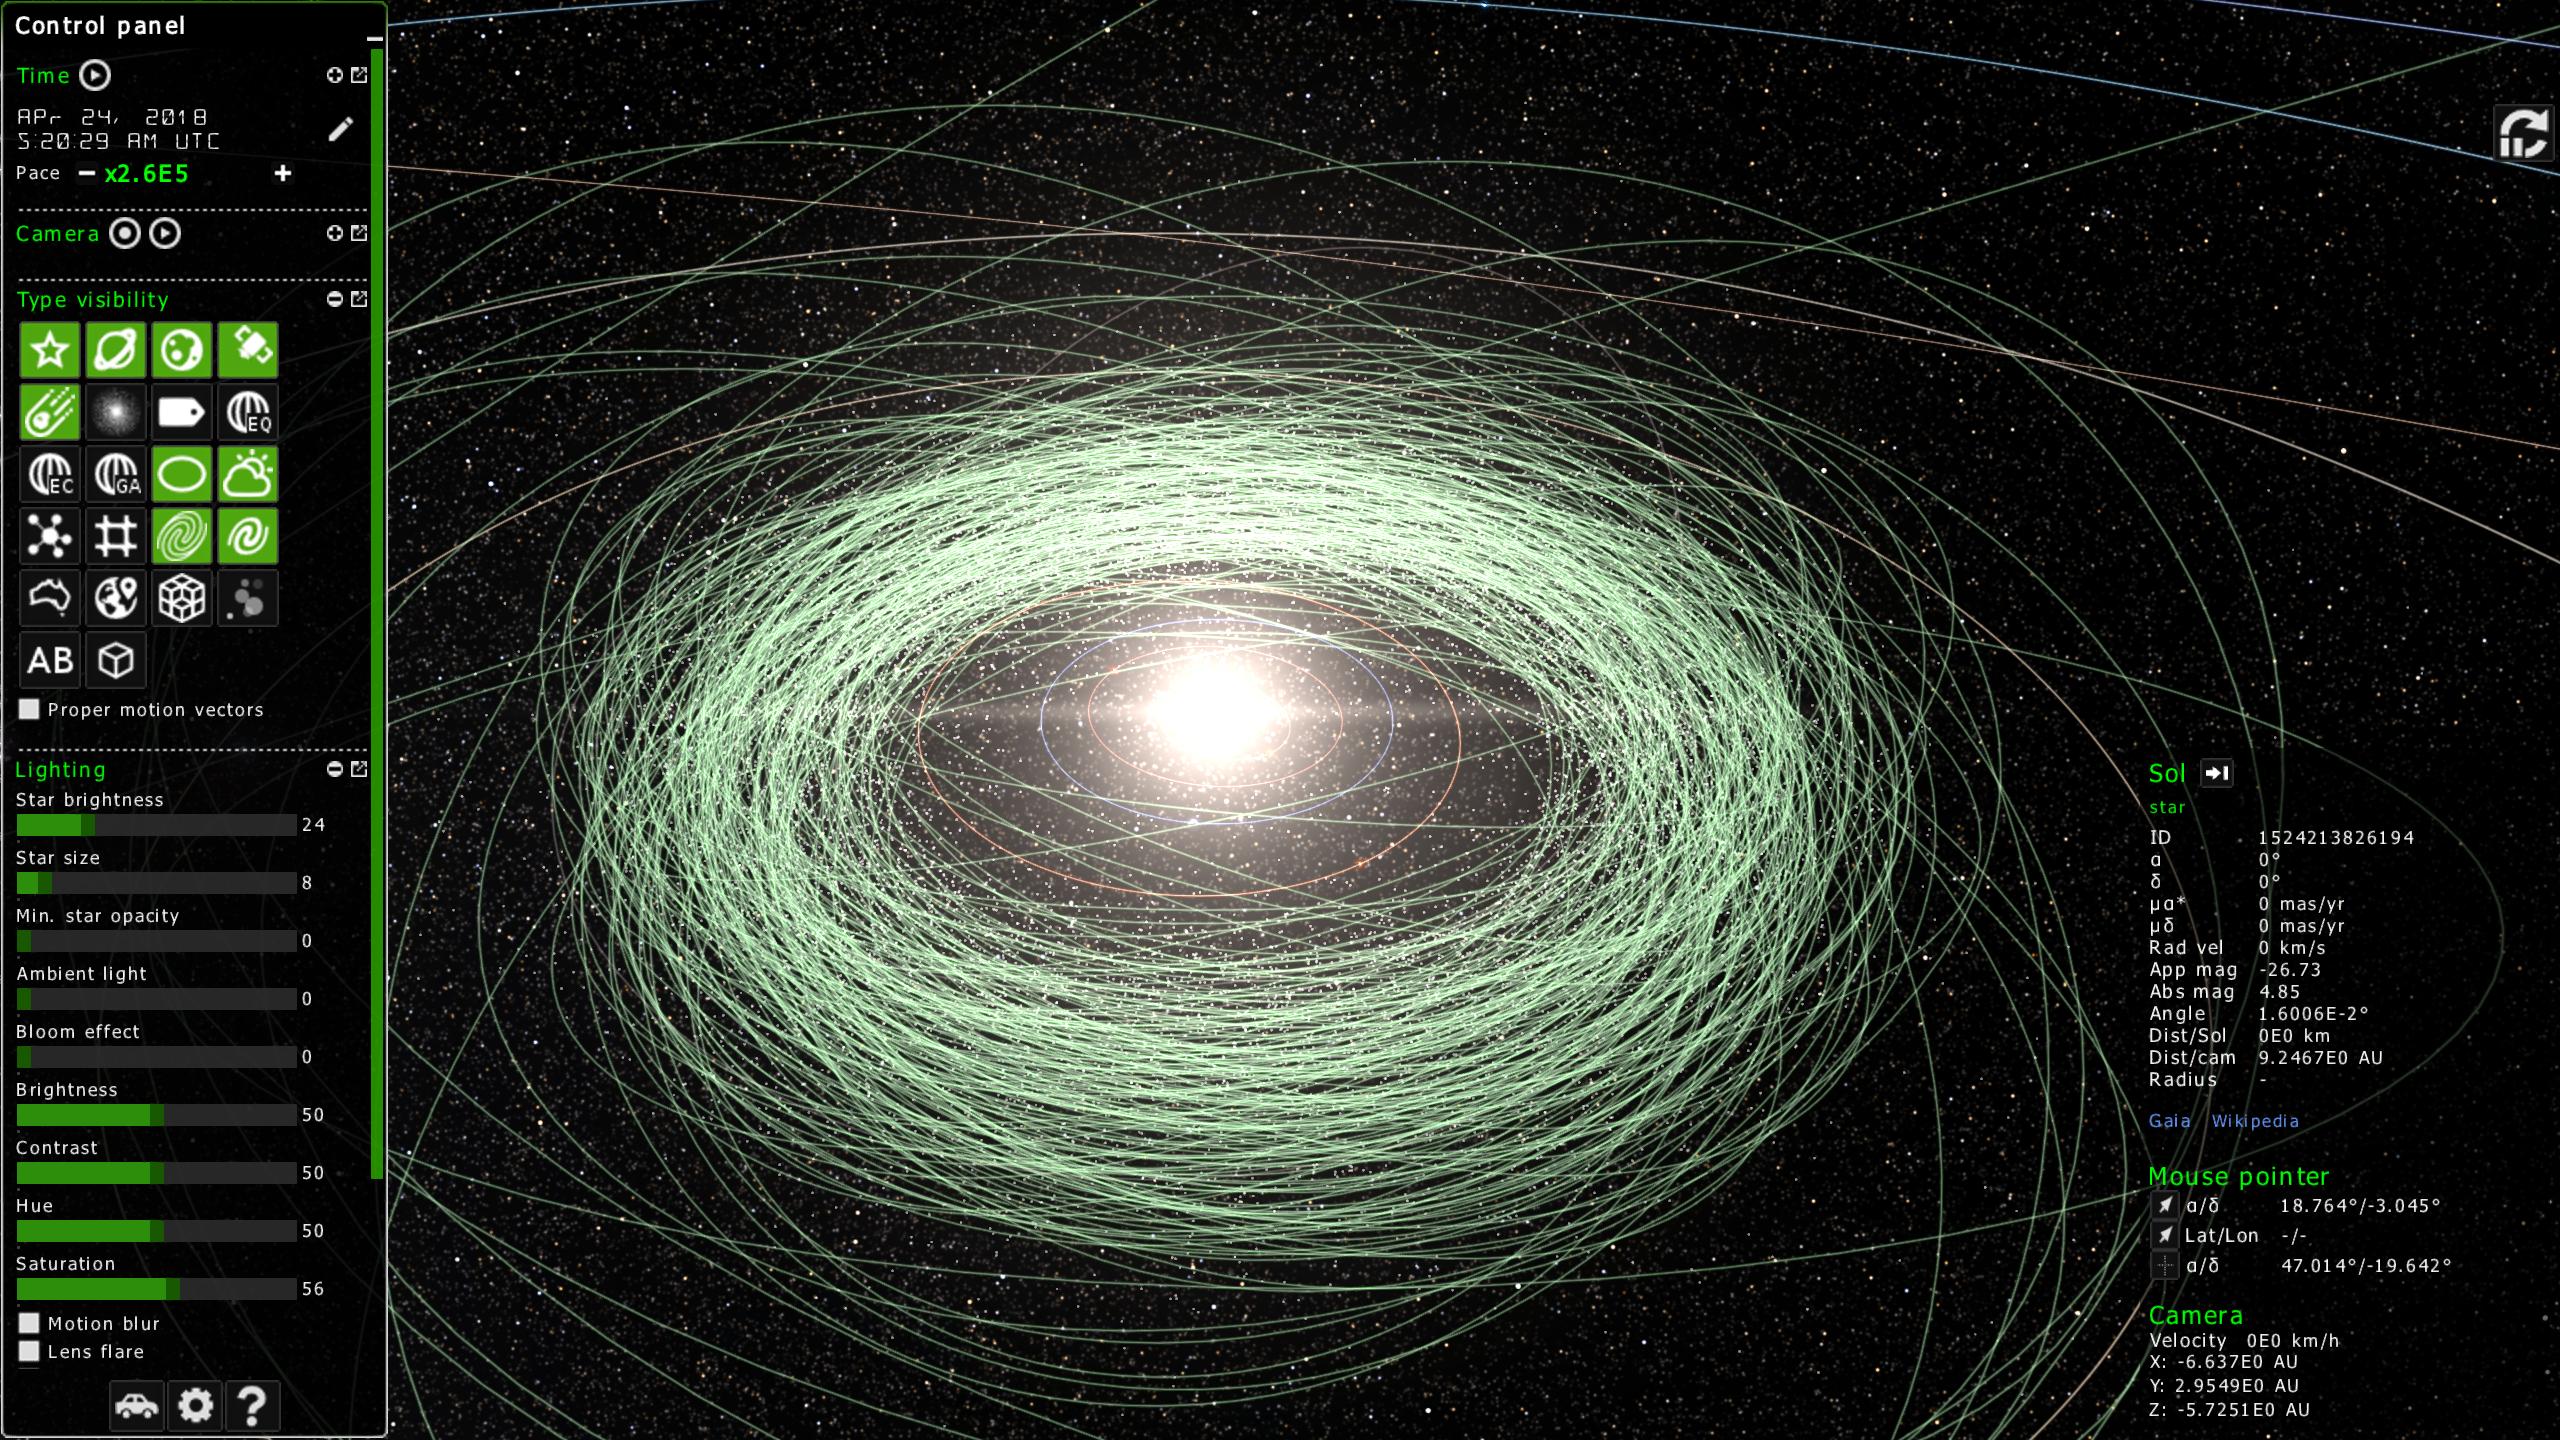 zentrum für astronomie gaia sky